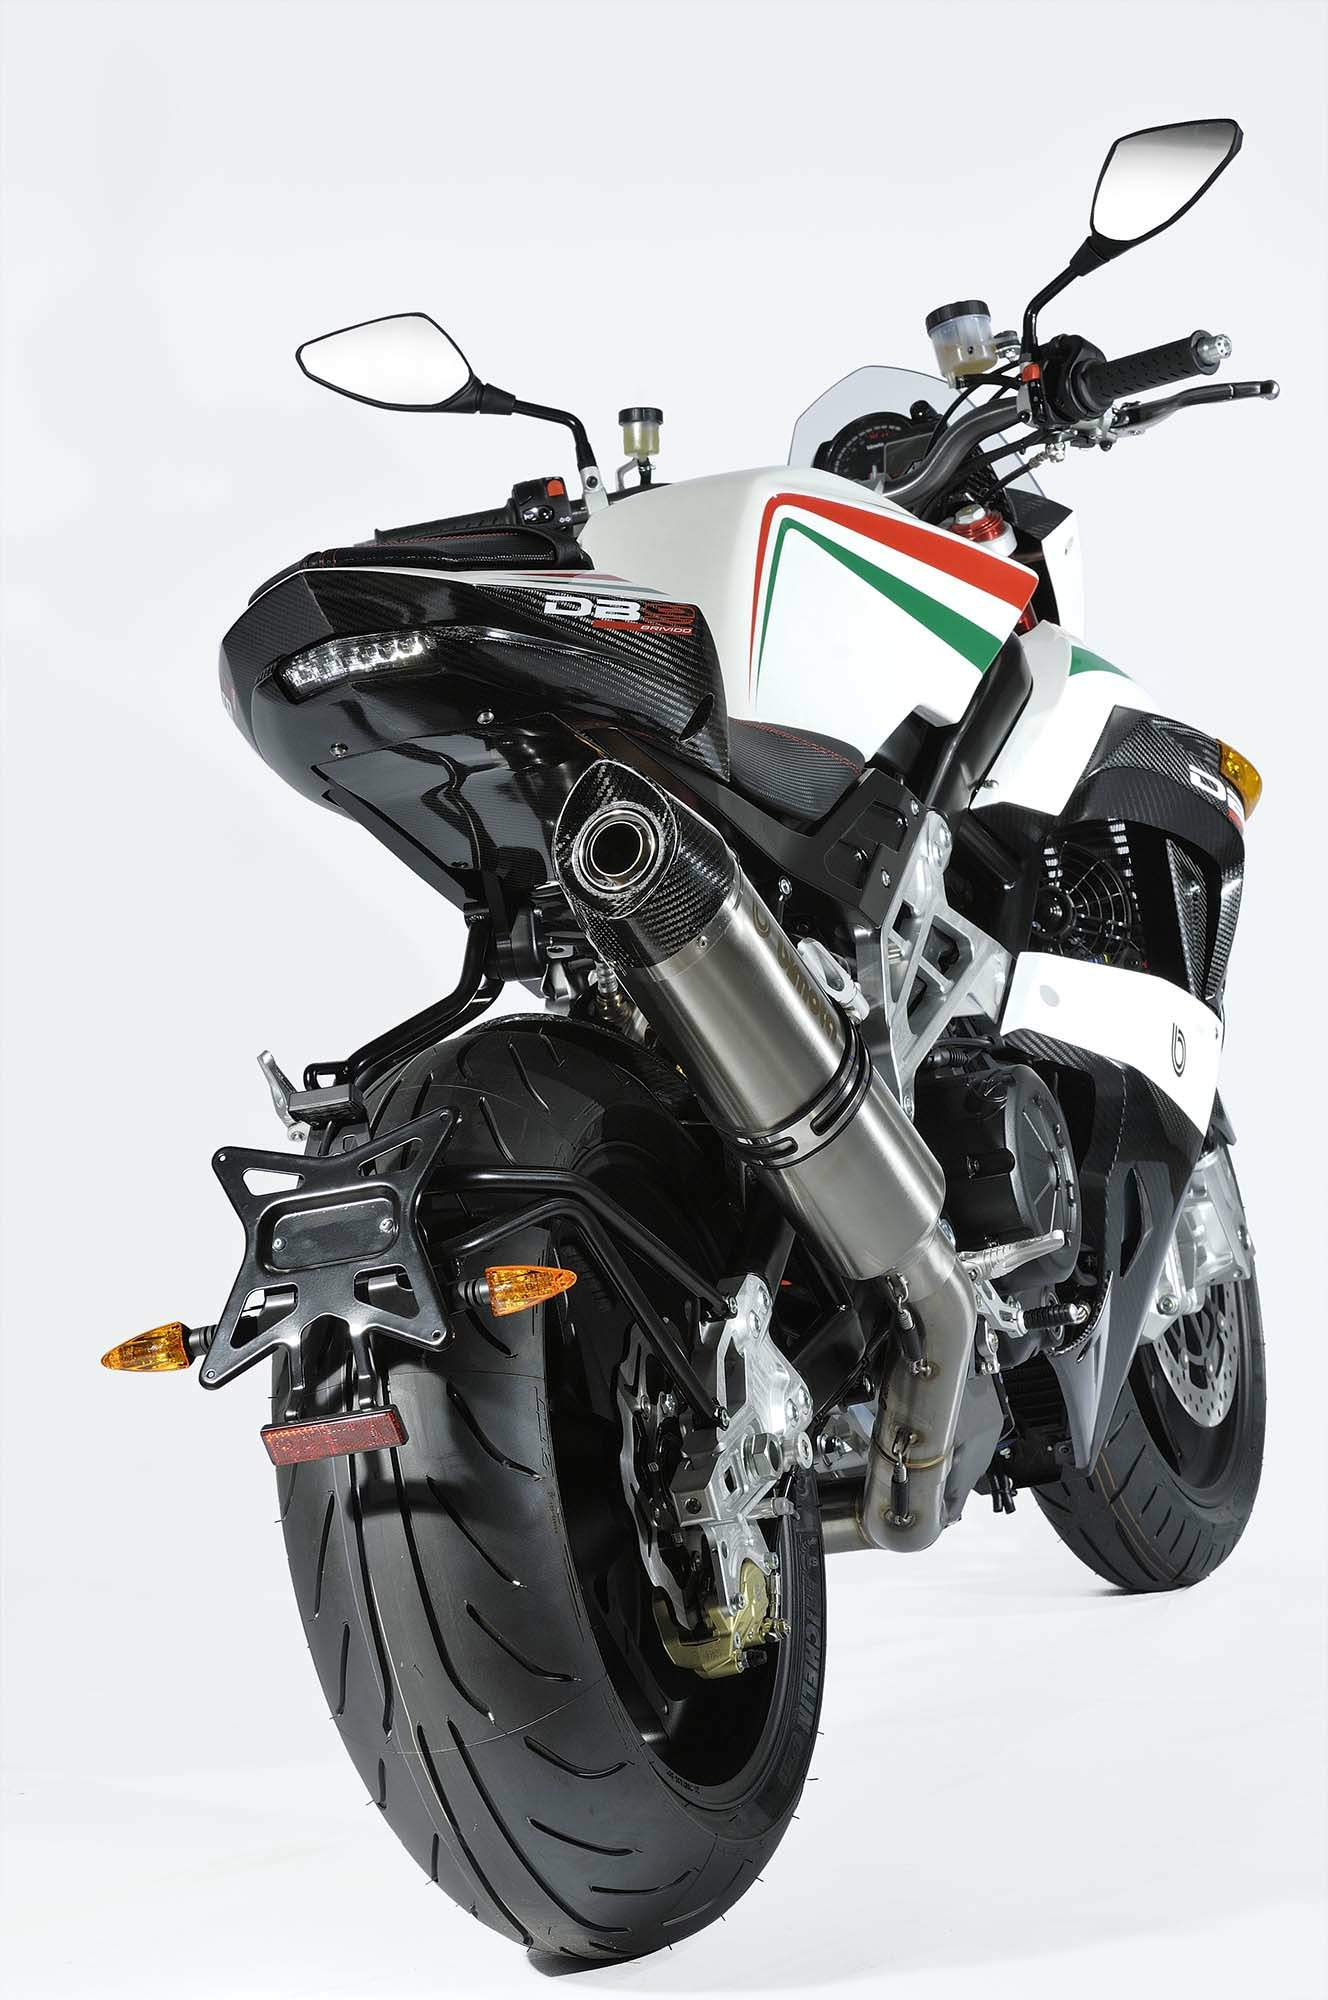 2012 Bimota DB 9 Brivido